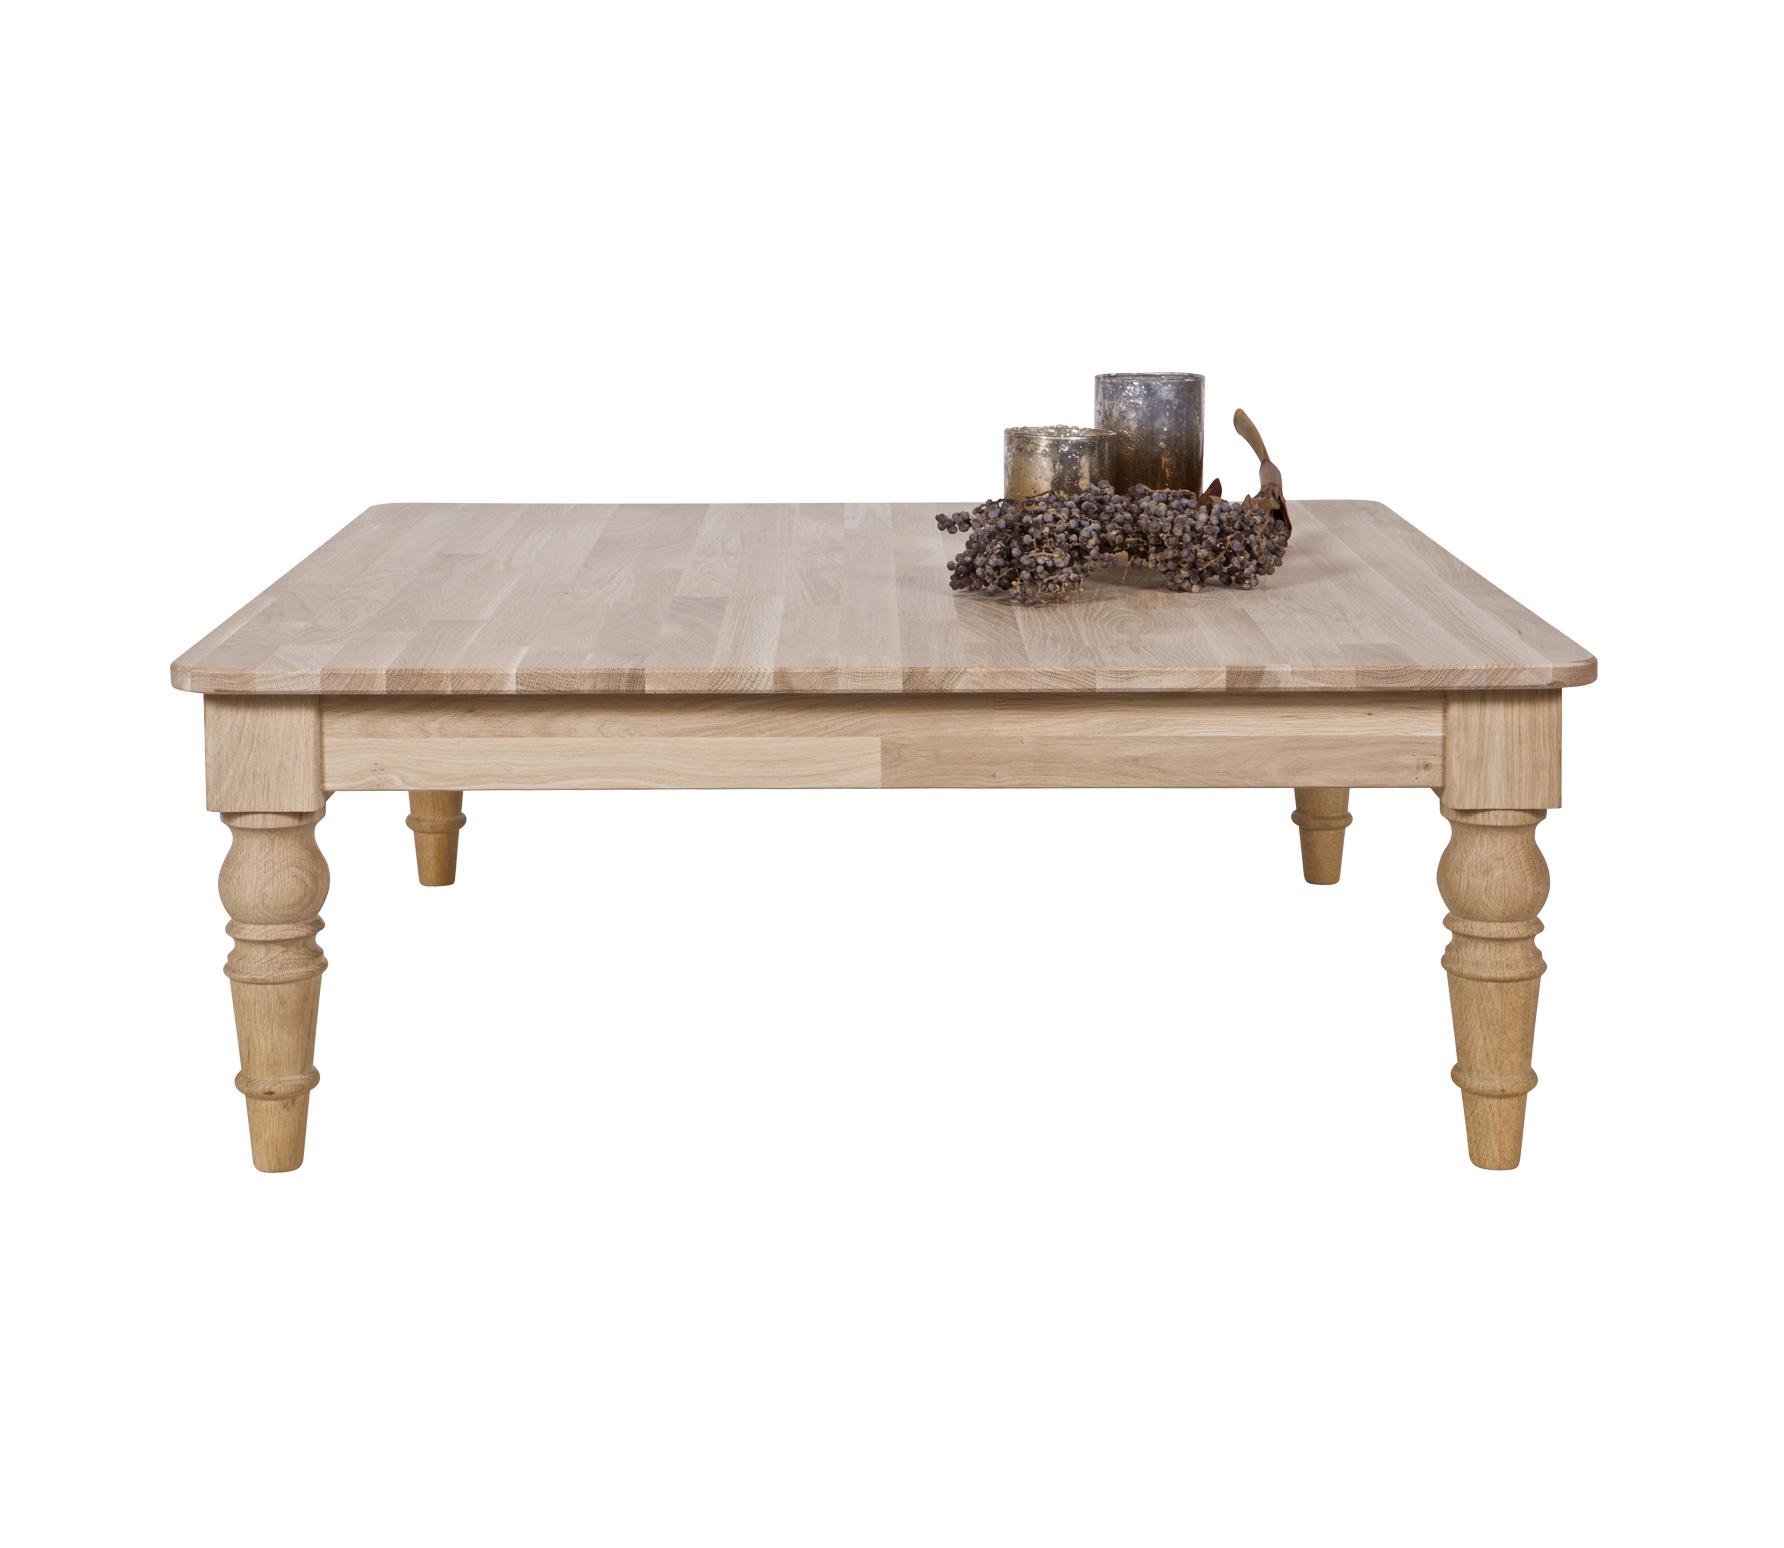 WOOOD Qwint salontafel 98 x 98 x 38 cm massief eiken Onbehandeld